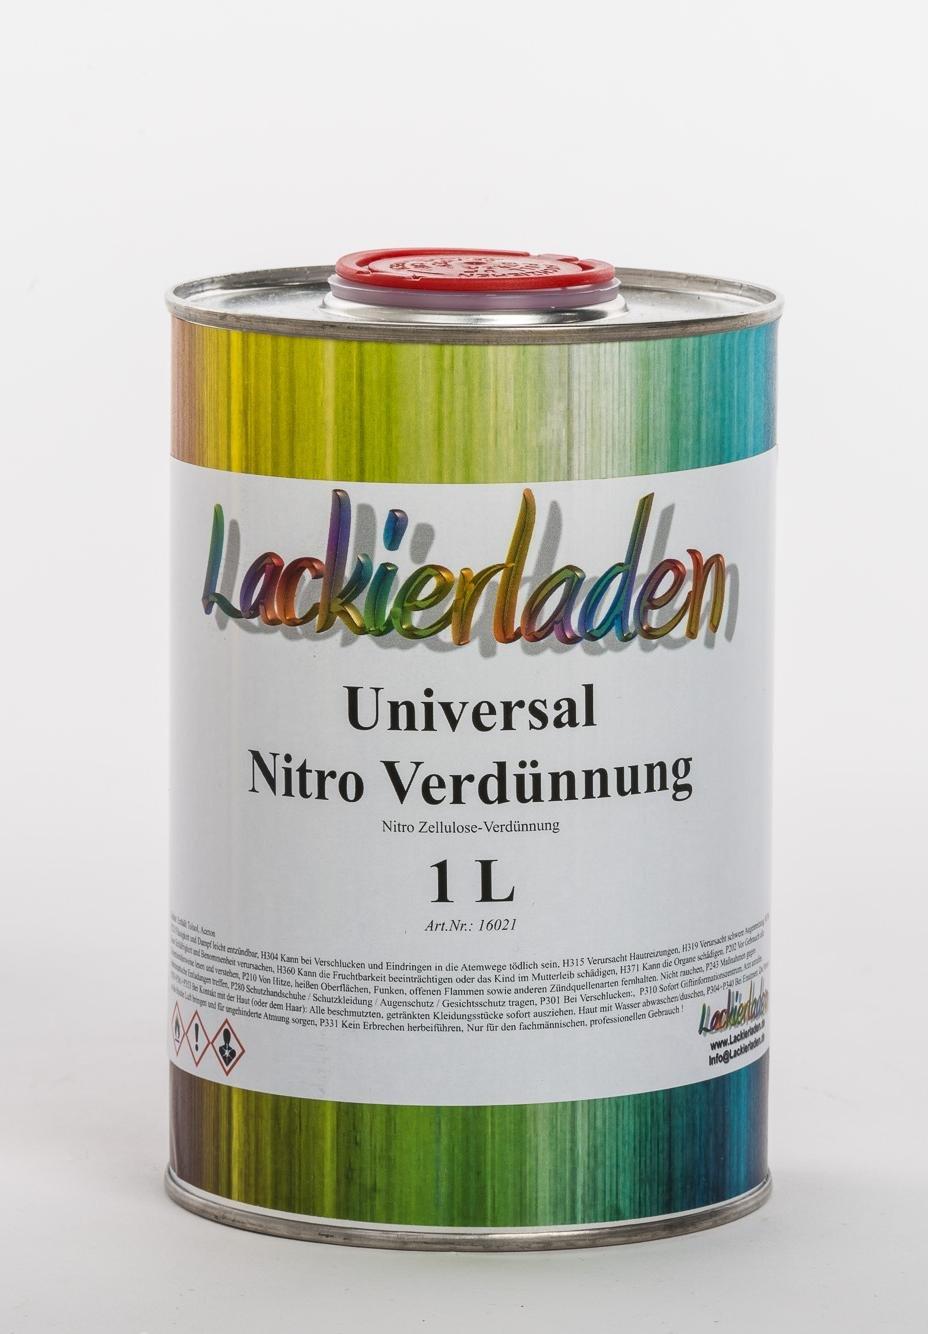 Universal Nitro Verdü nnung 1 L Lackierladen